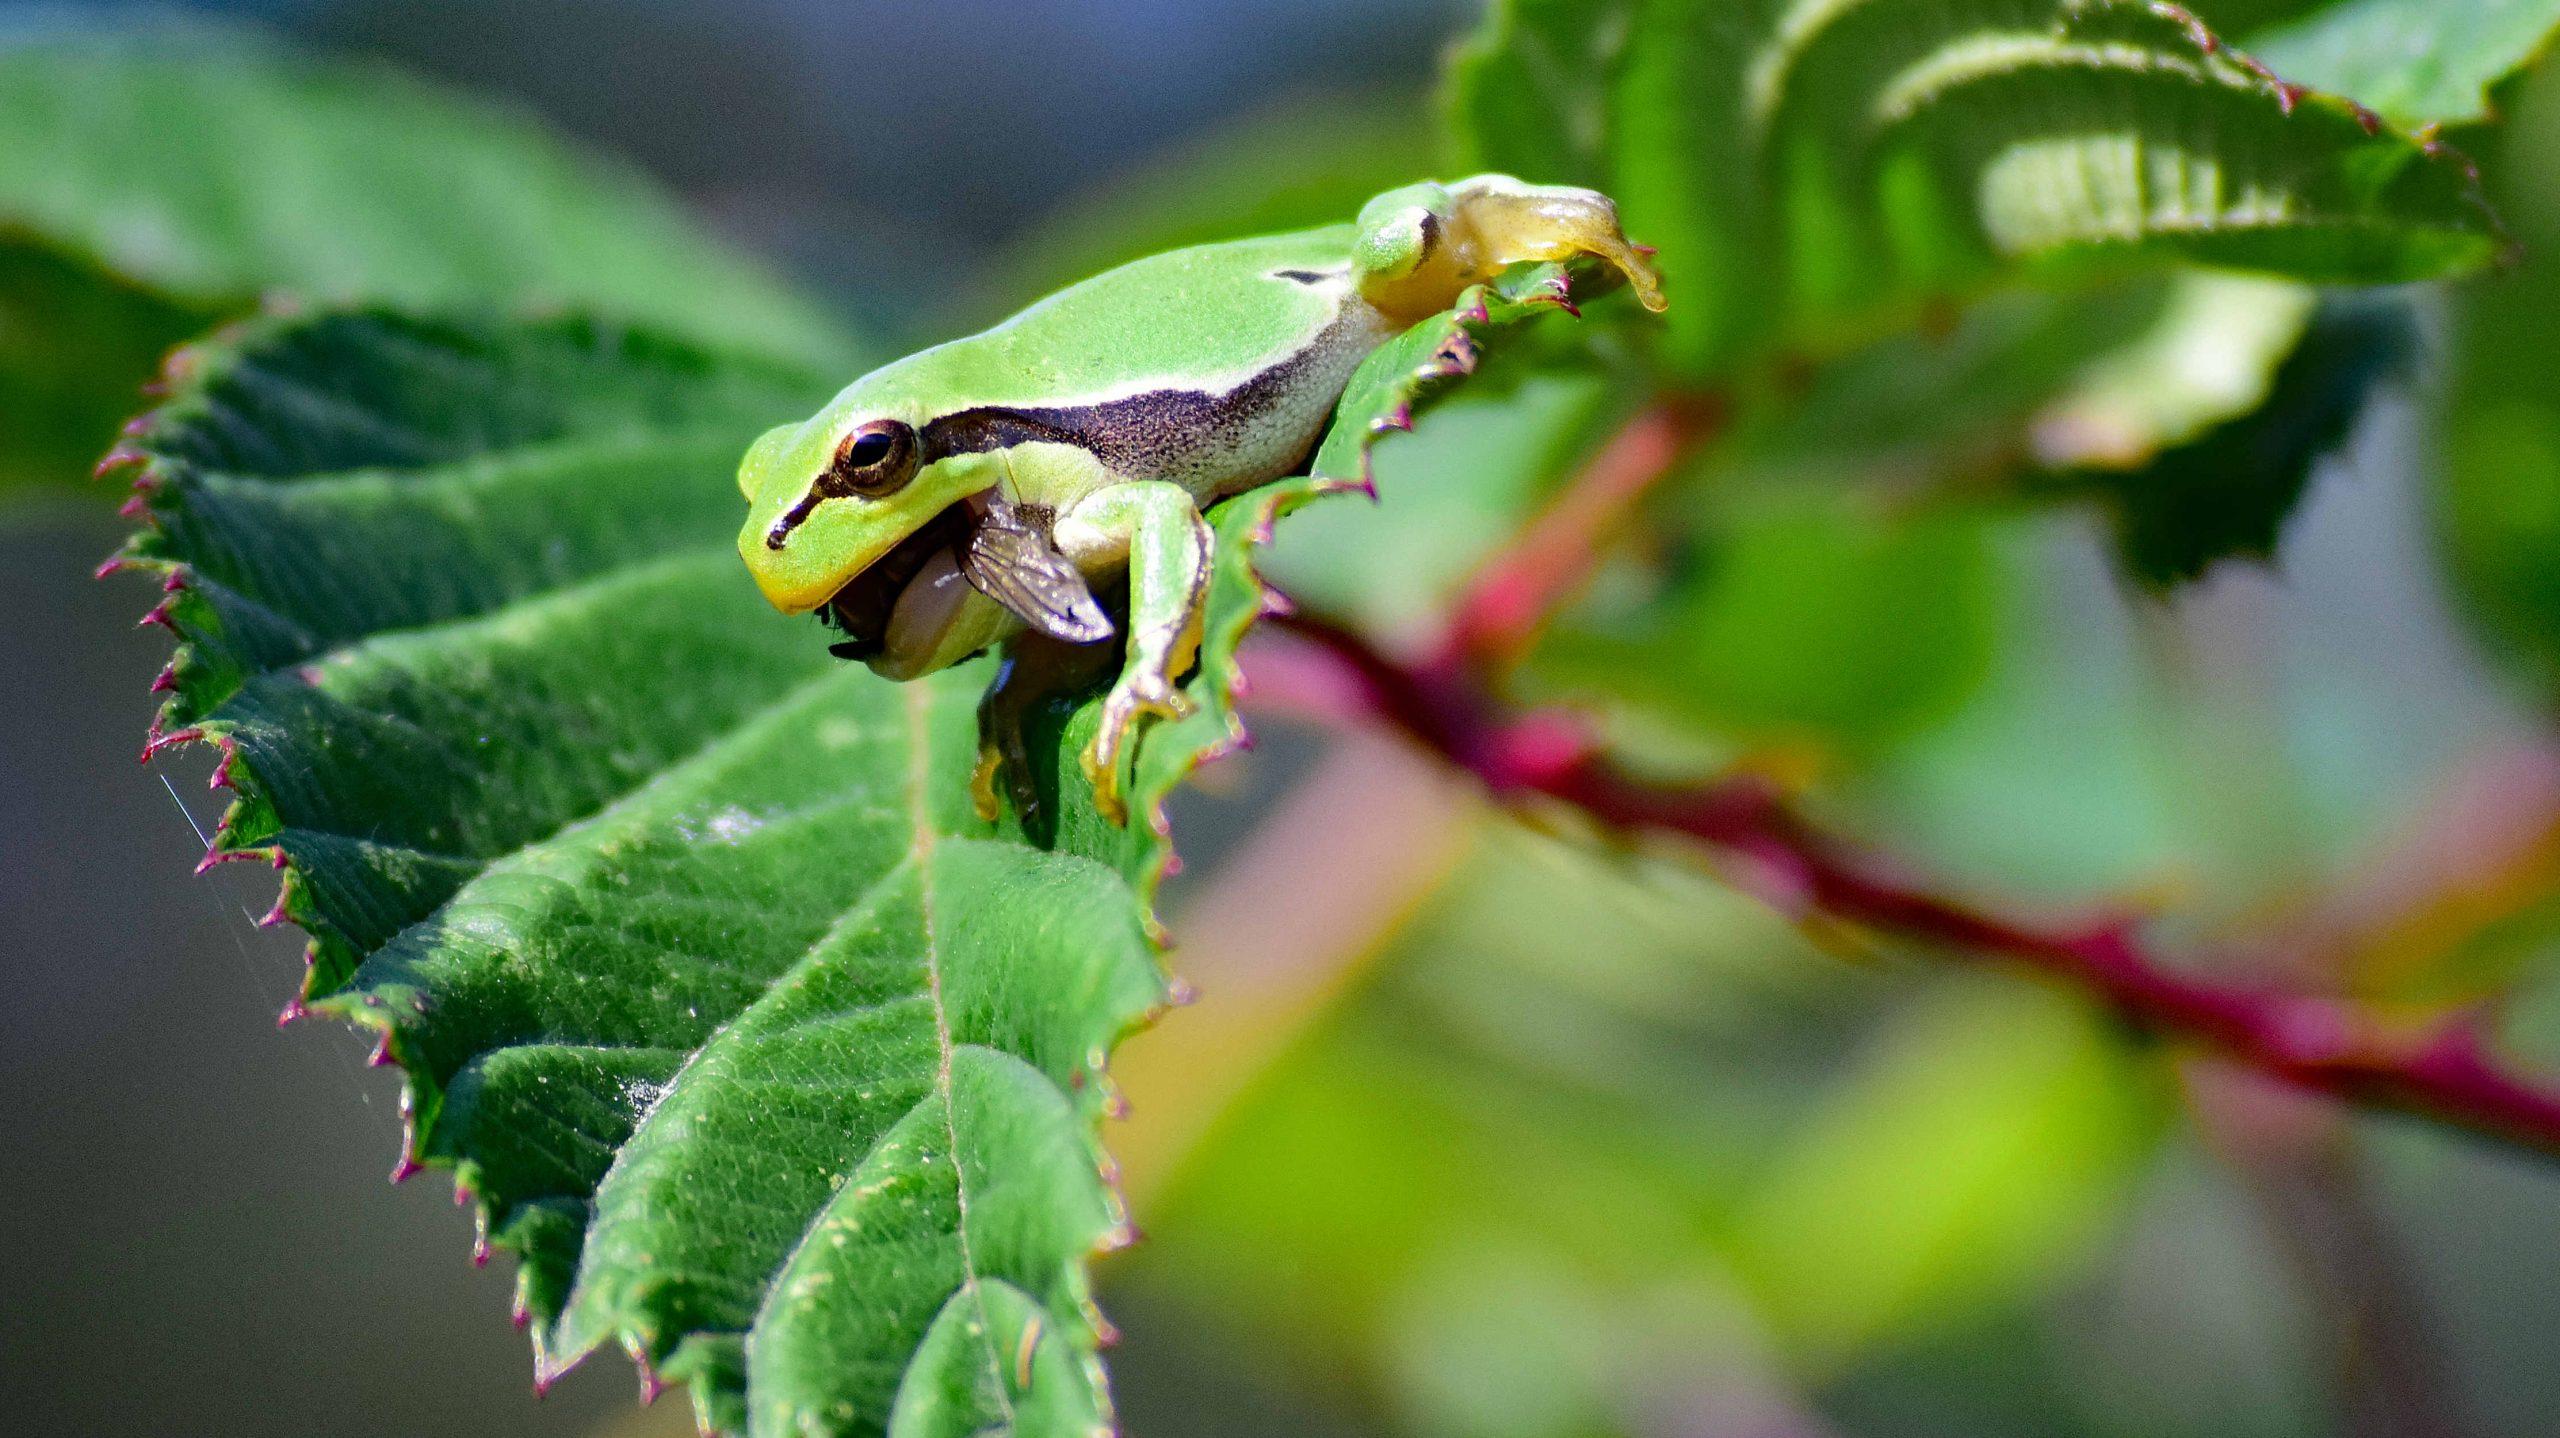 Laubfrosch mit Insekt